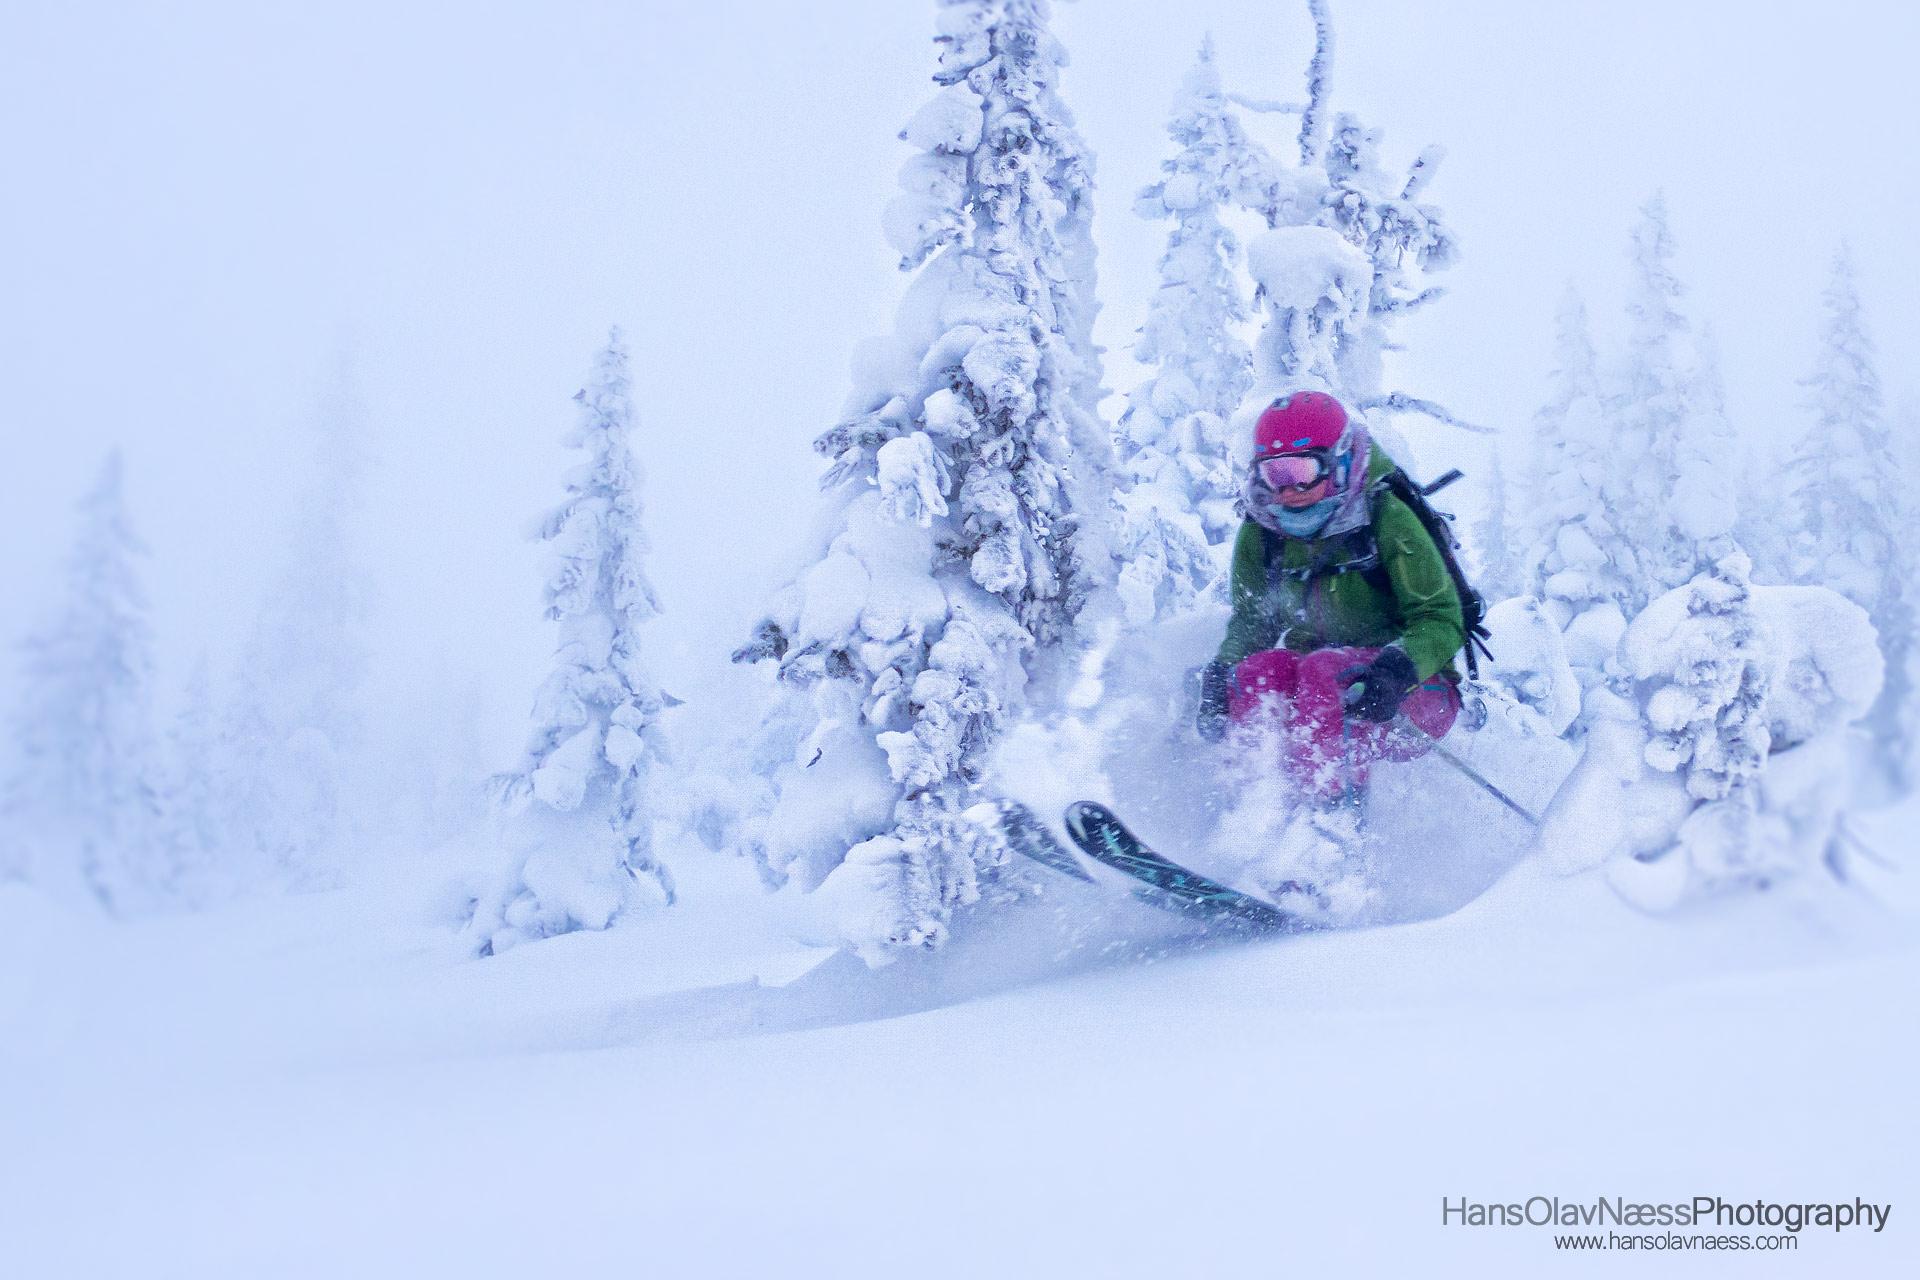 Ski_Norefjell_Kristin_DSCF2013C_www.hansolavnaess.com_wix1980_1280